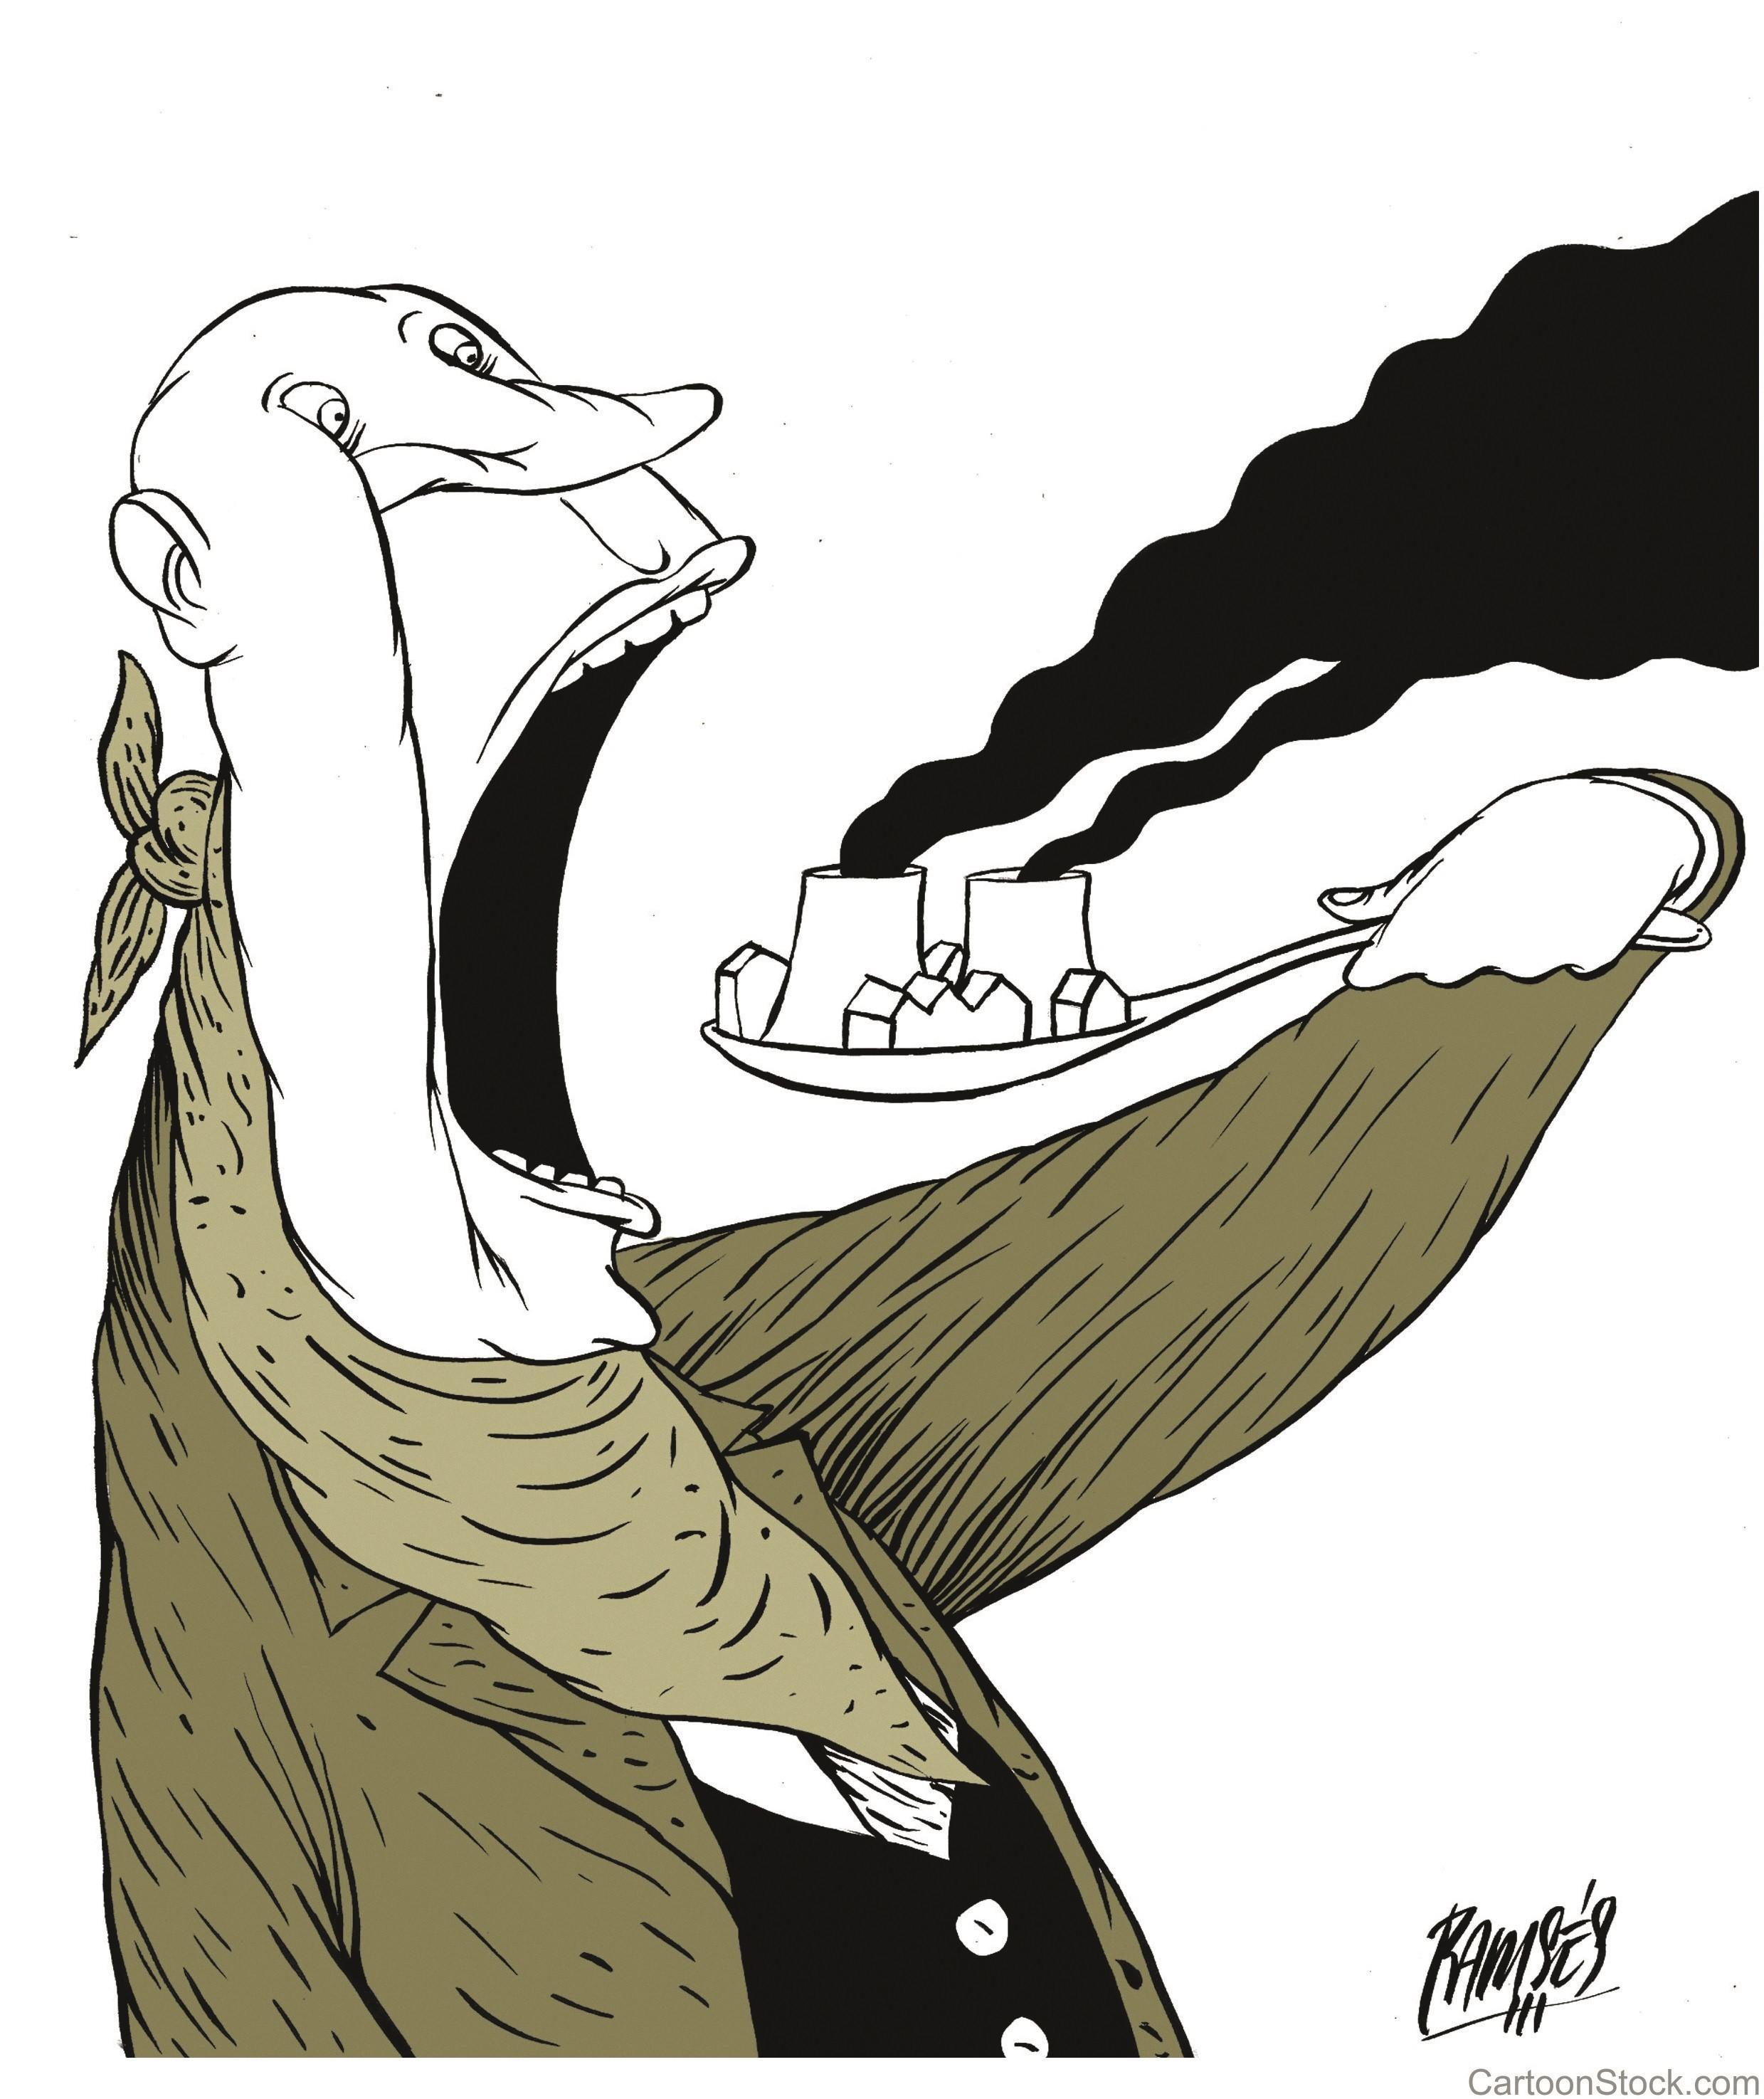 Greed and Pollution, Morales Izquierdo, 2016.